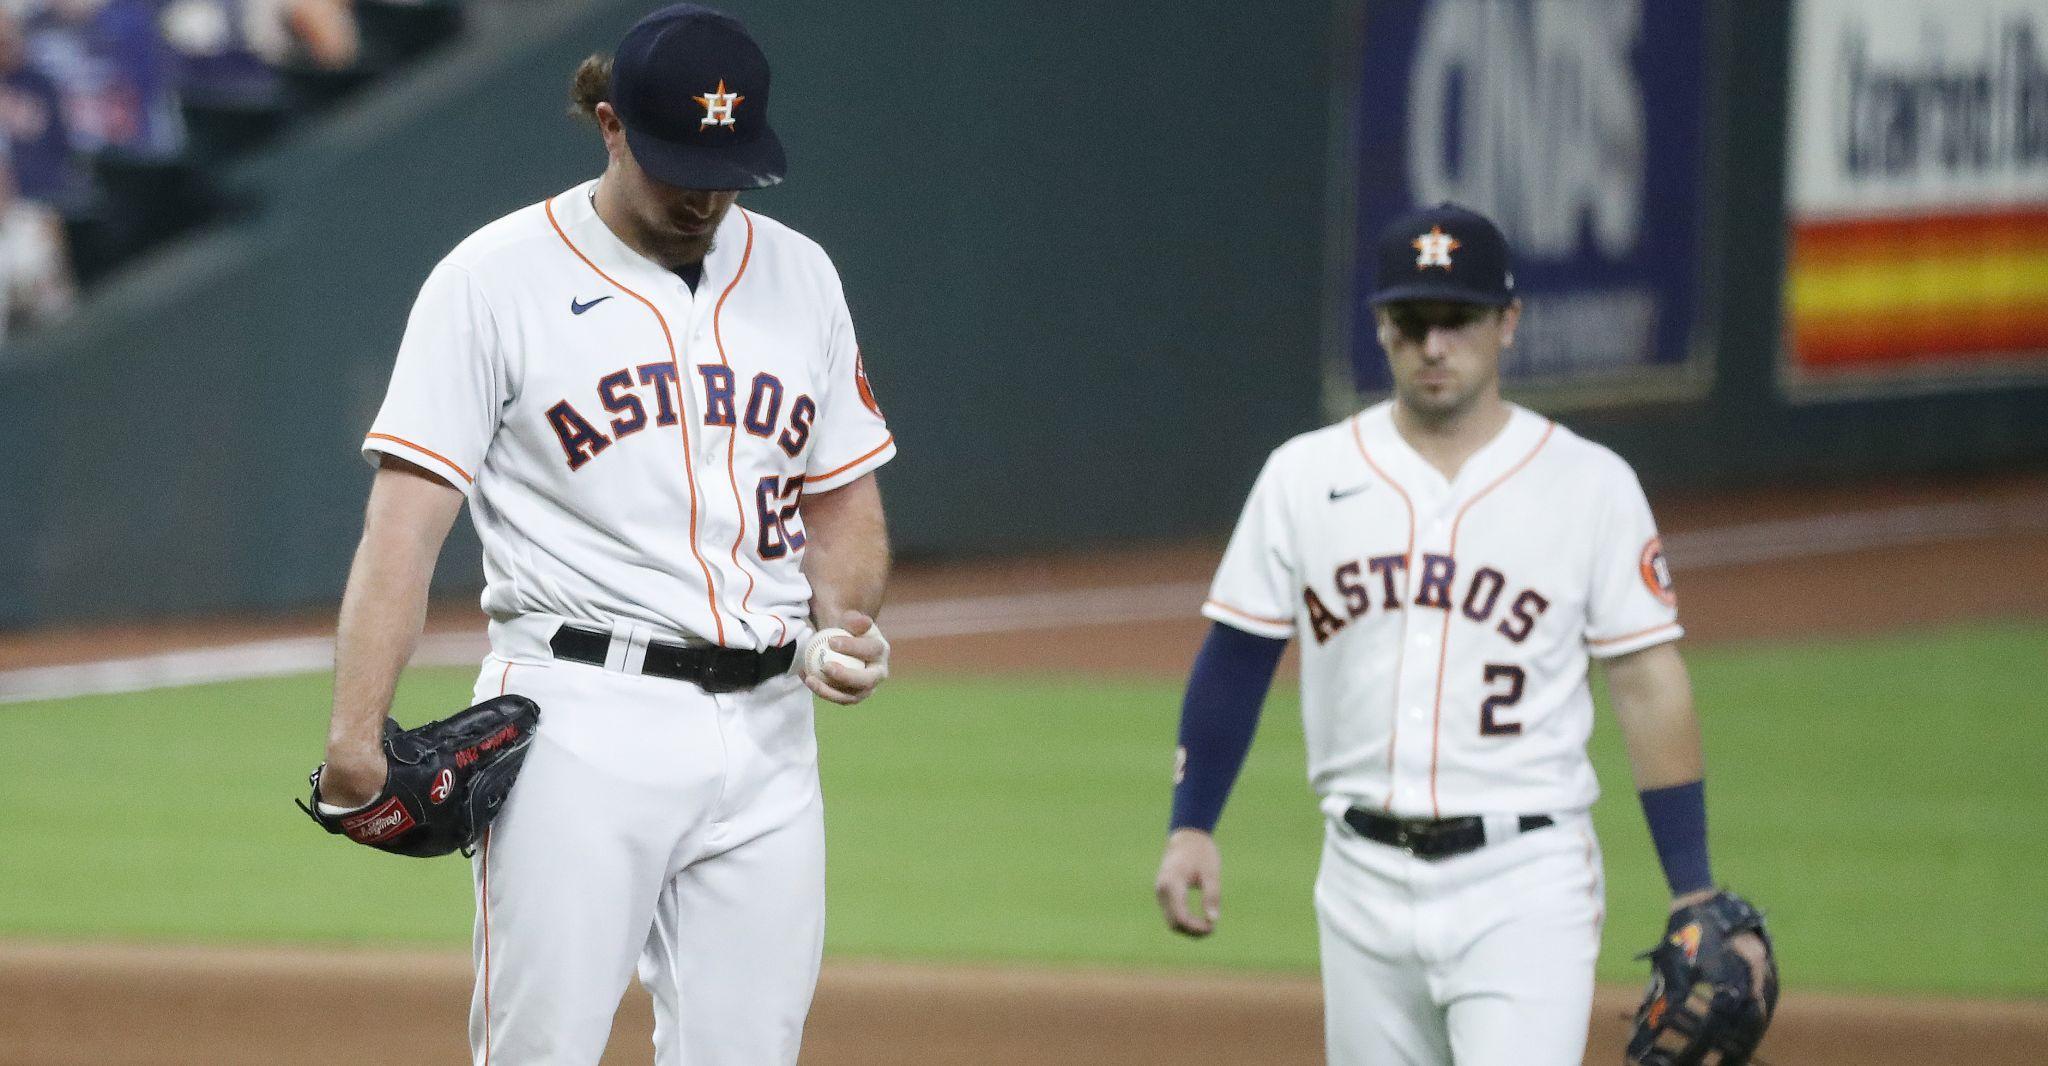 Astros insider: Stuck in a sluggish September - Houston Chronicle